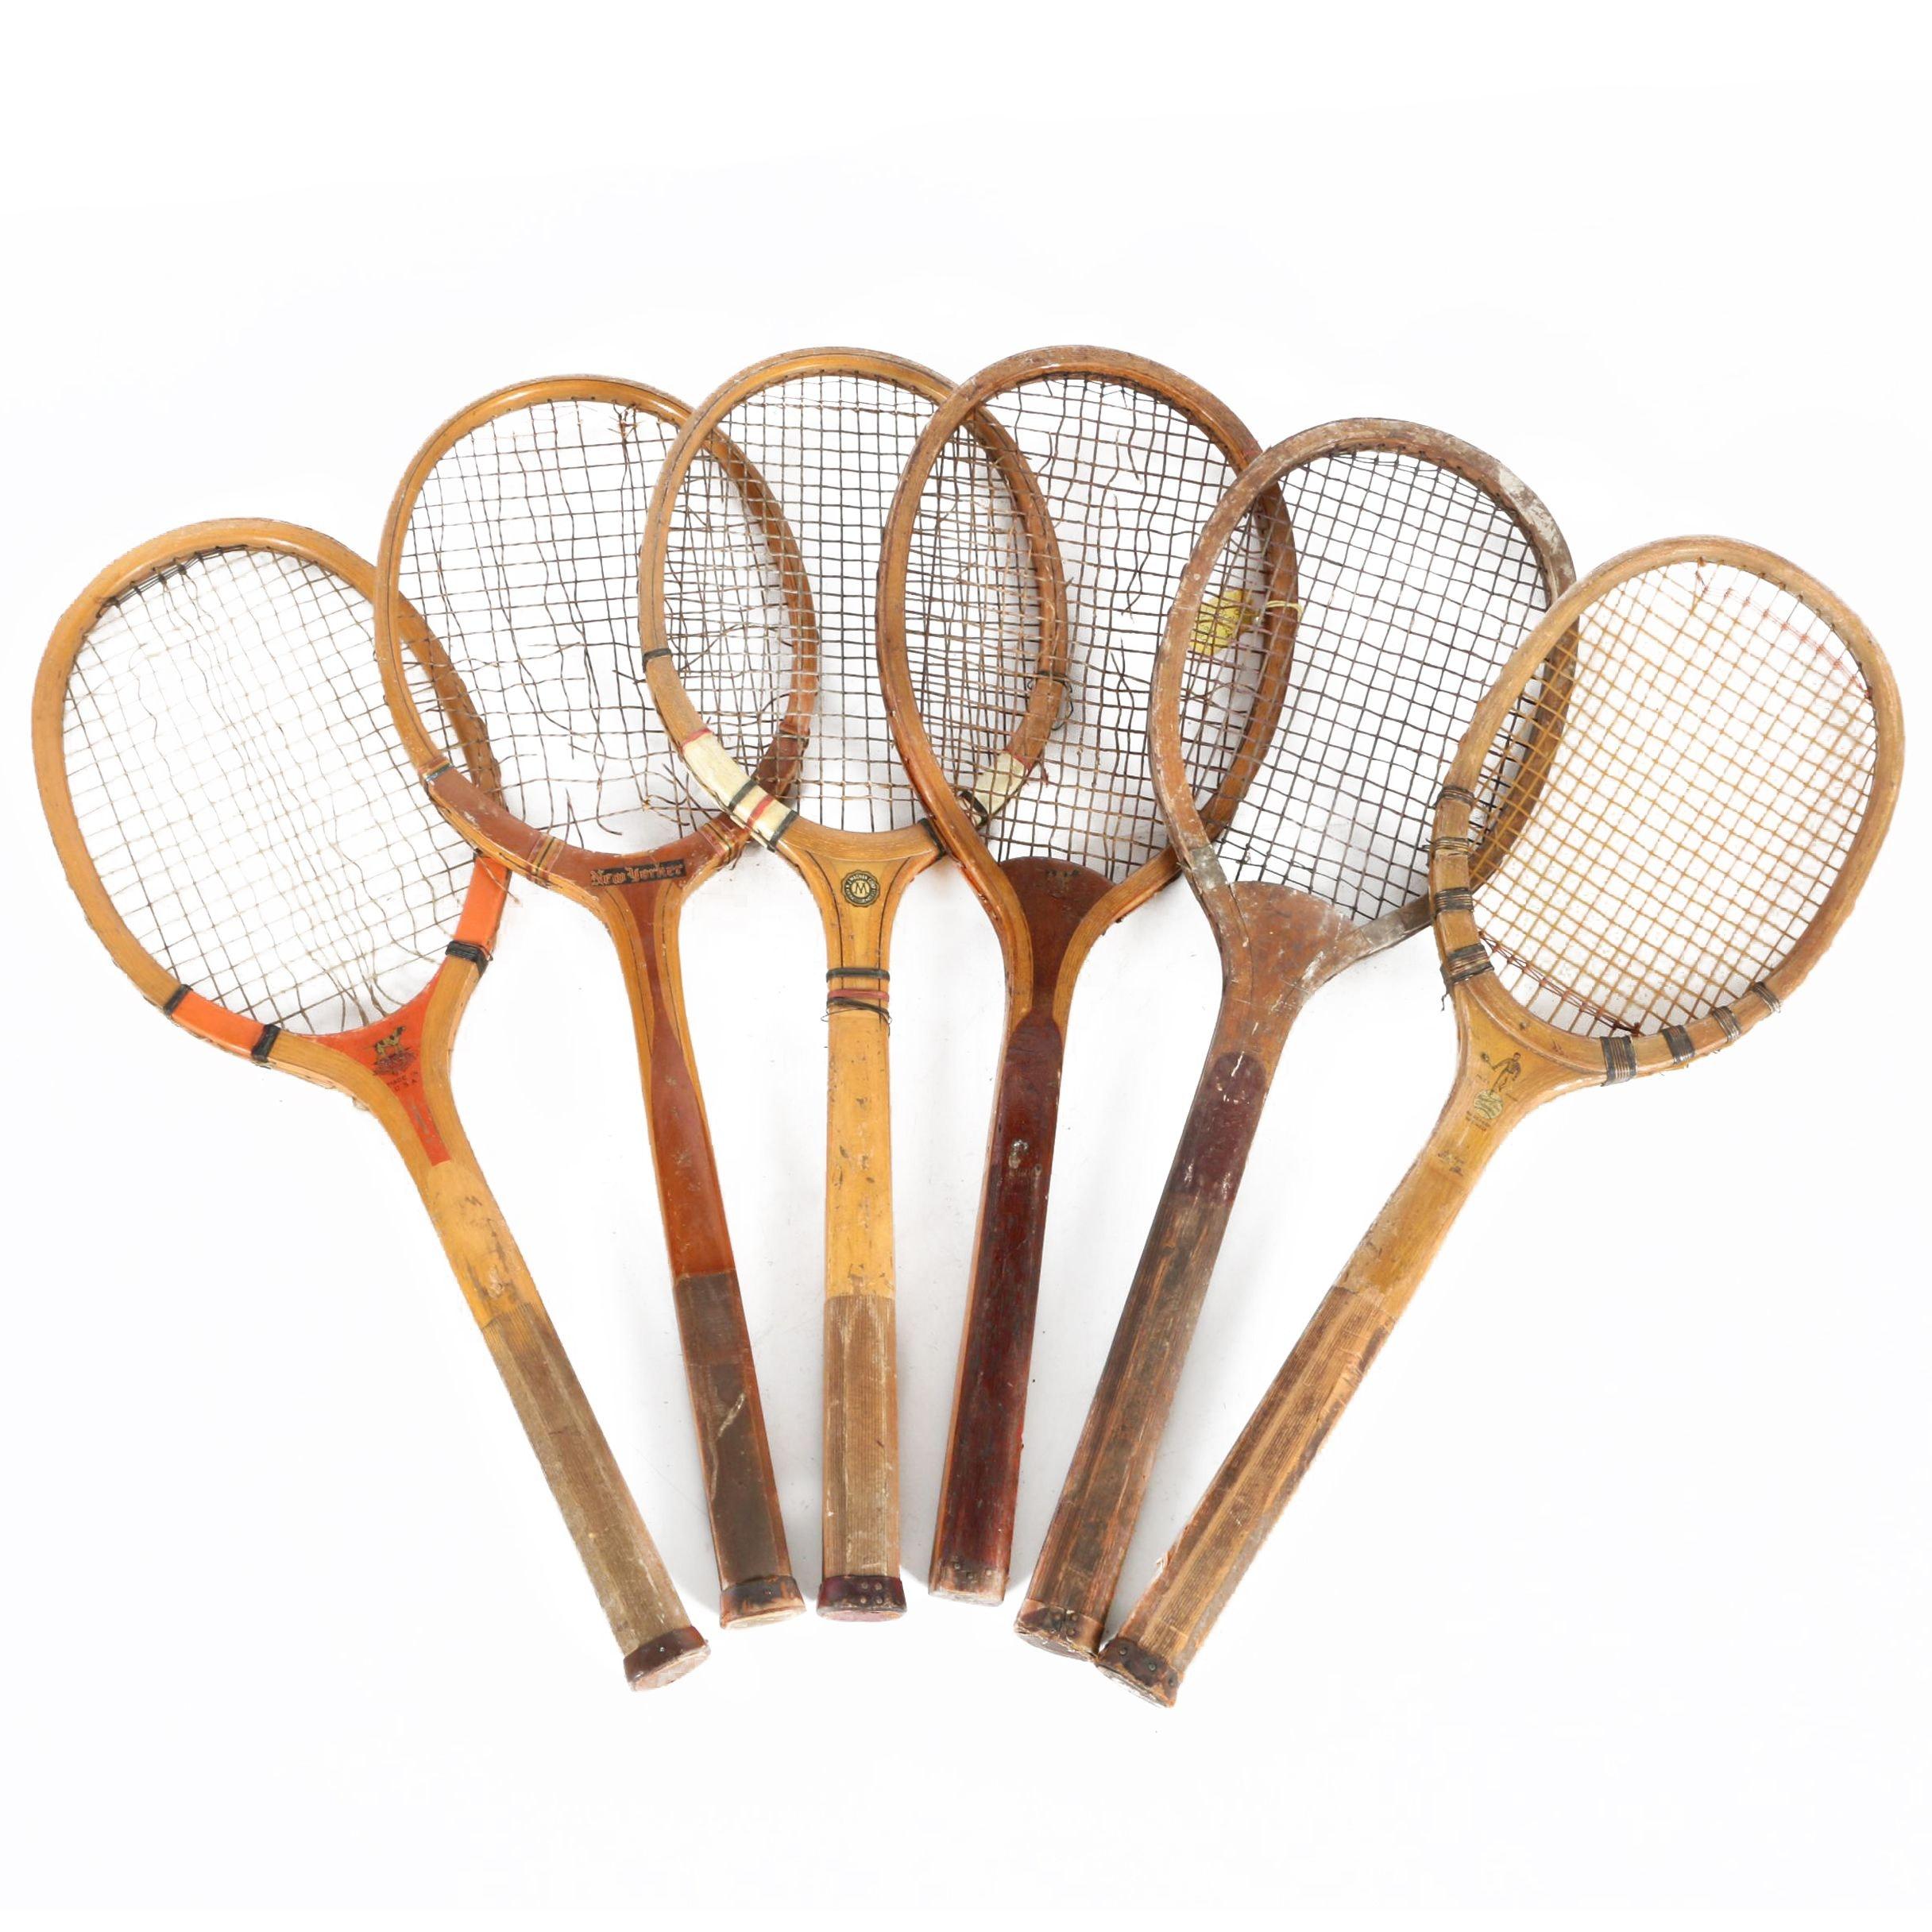 Vintage Racquets by Ken-Wel, Draper & Maynard and More